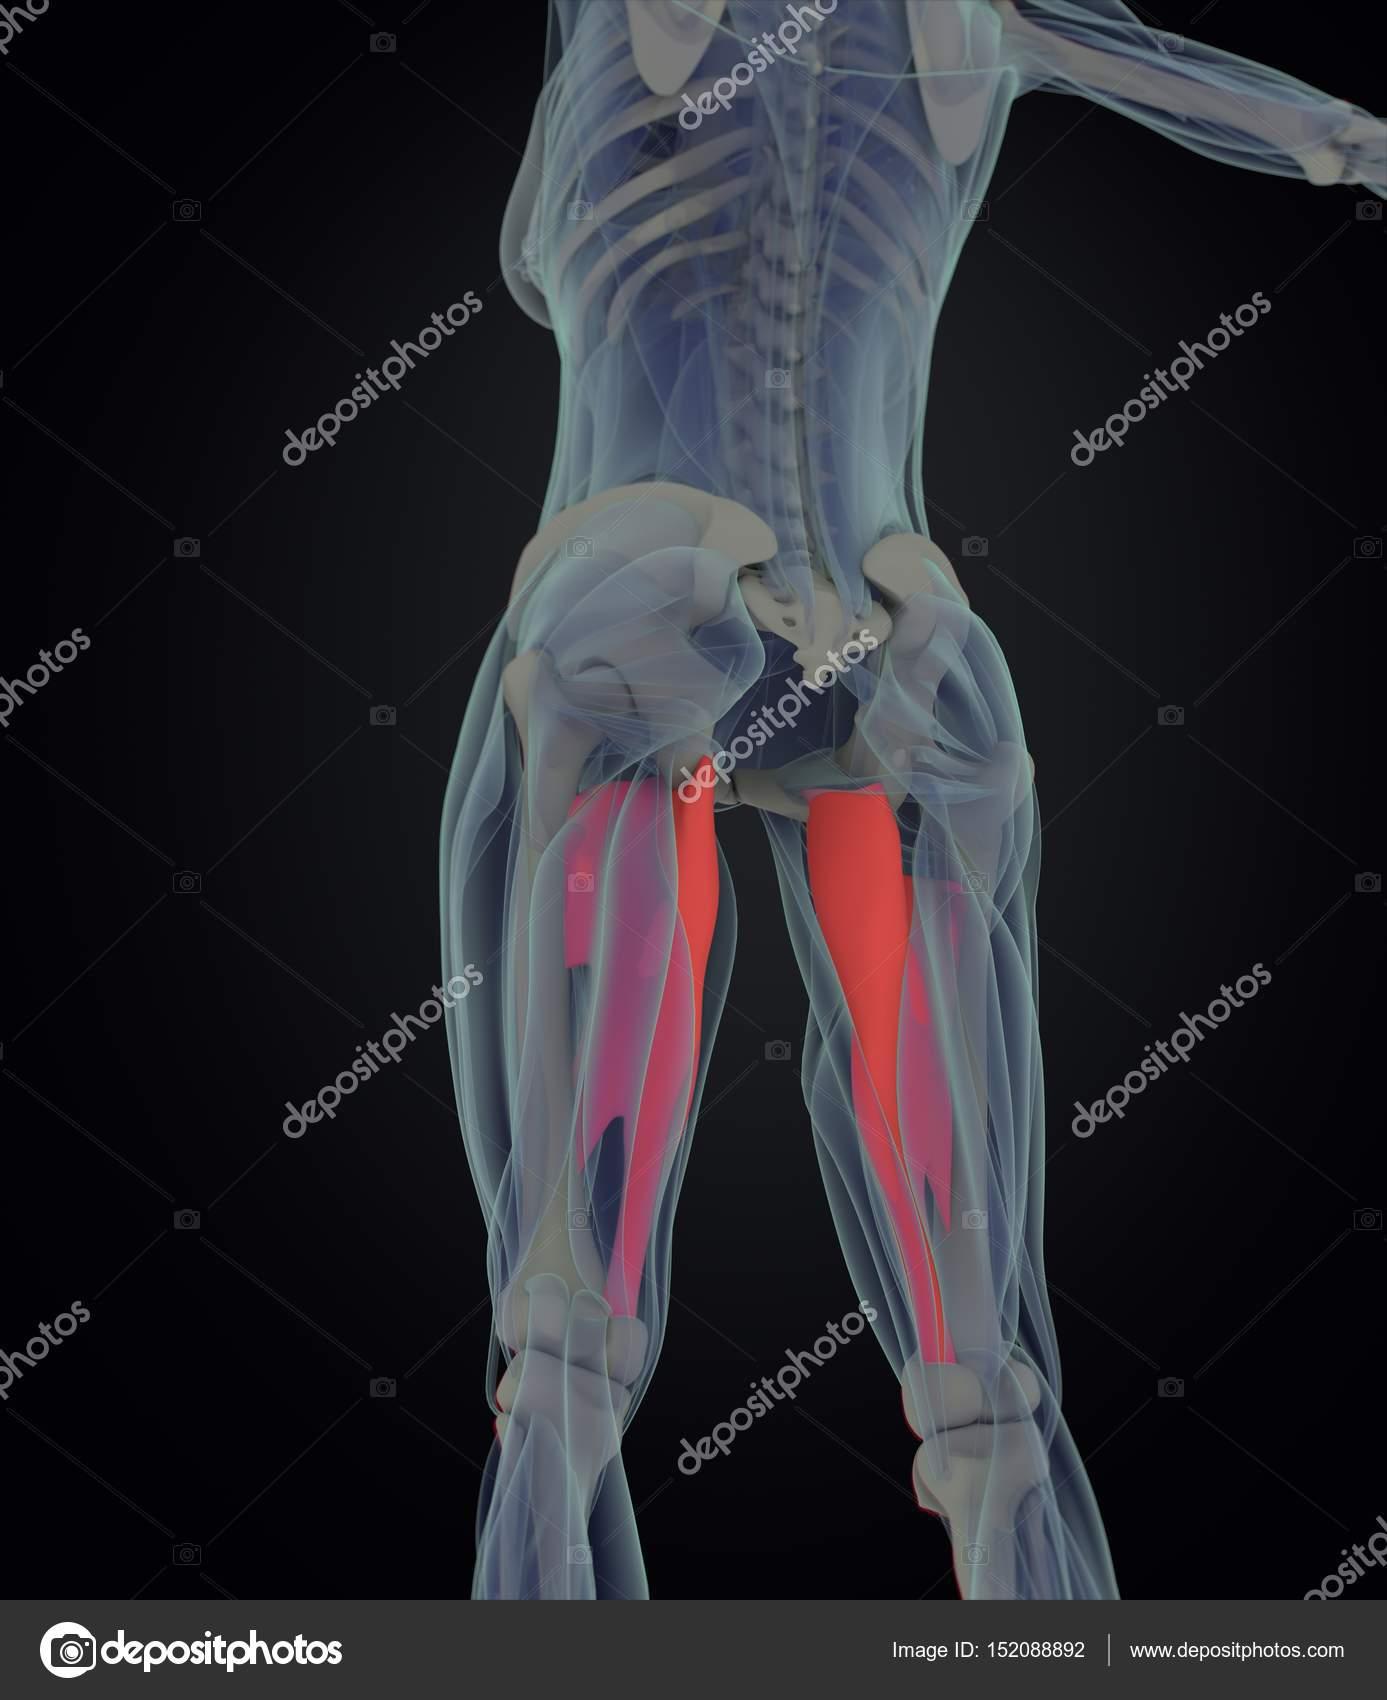 adductor Muscles anatomy model — Stock Photo © AnatomyInsider #152088892